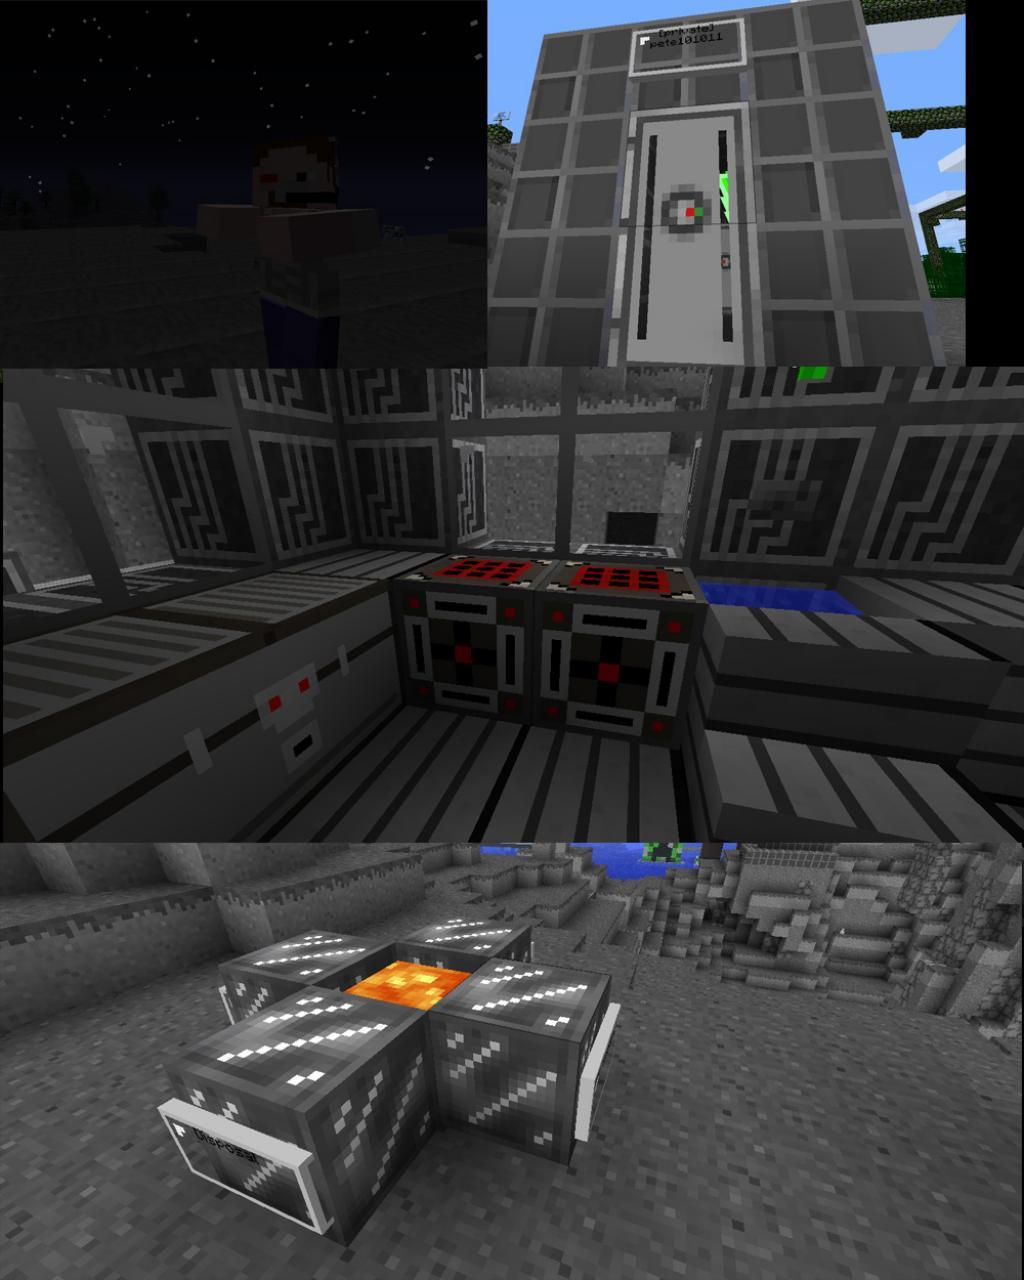 In-game photos.